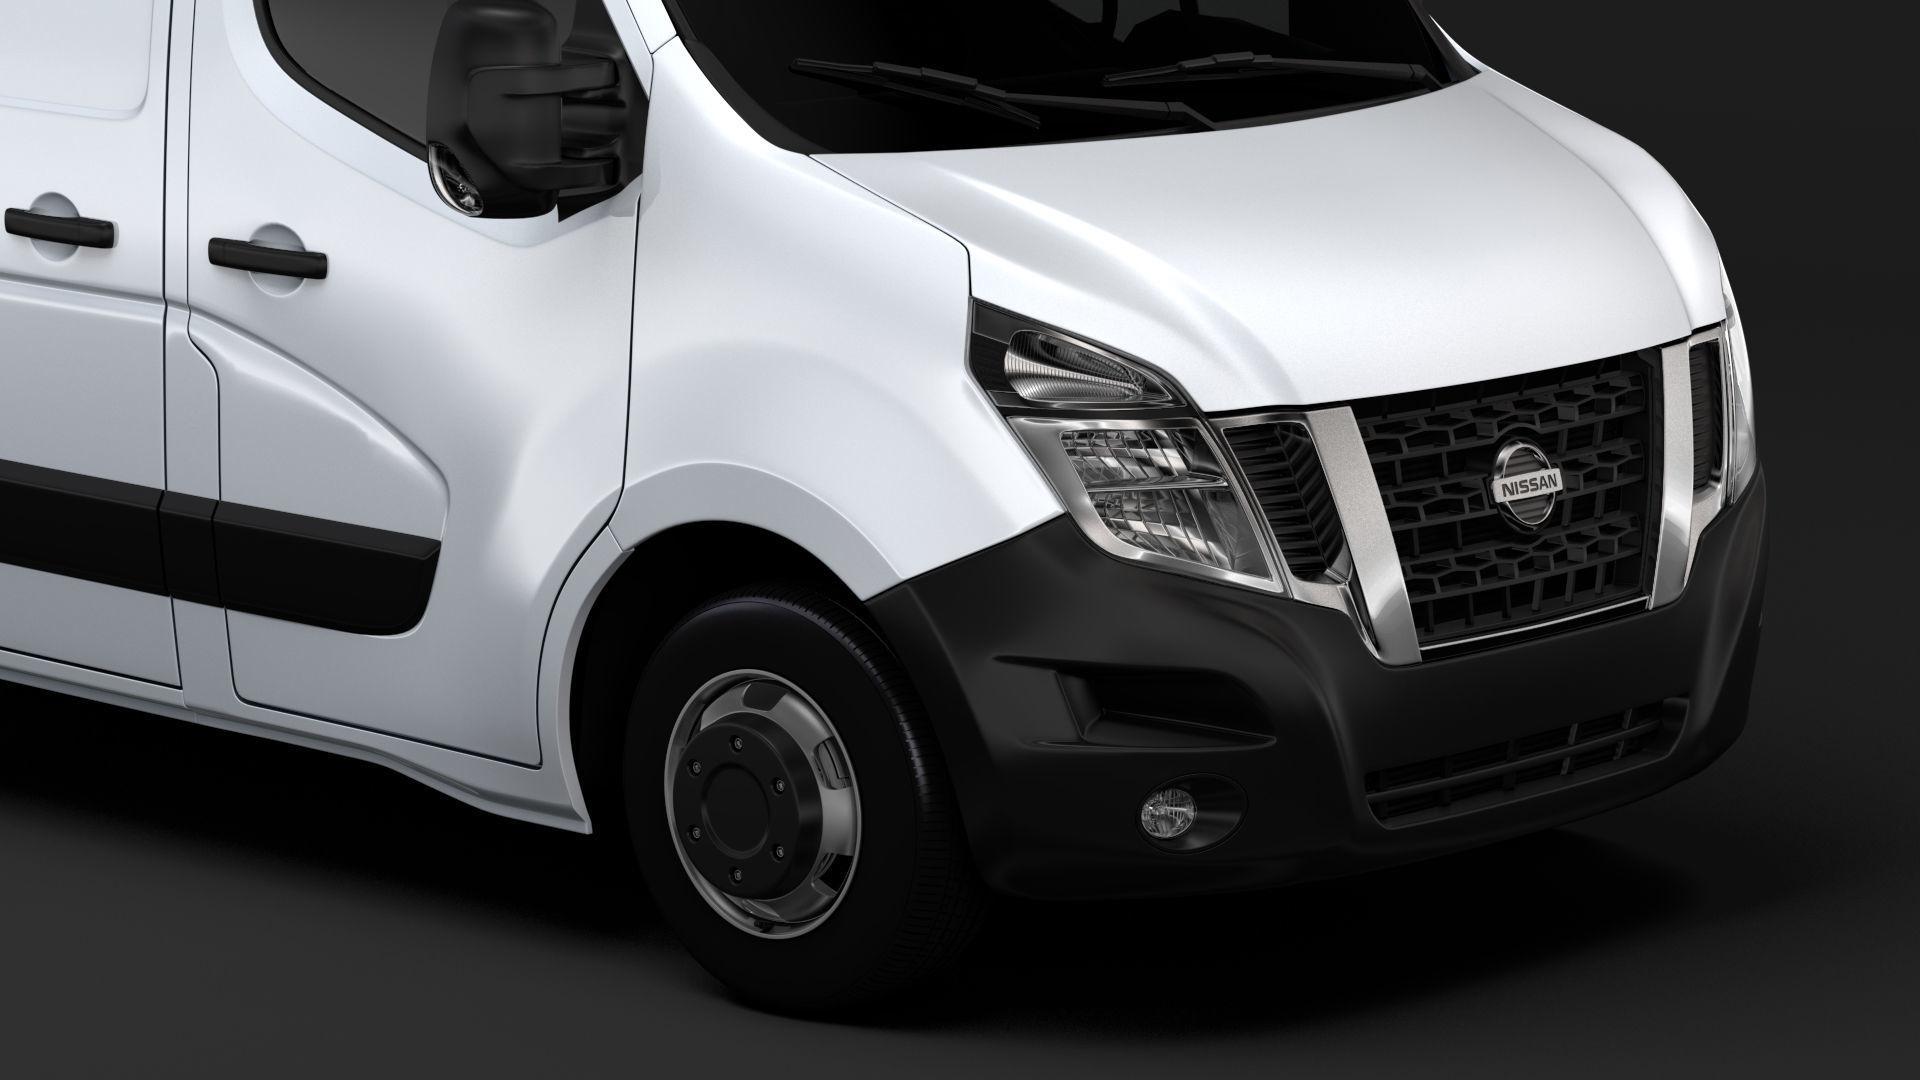 Nissan Nv 400 L1h1 Van 2017 3d Model Cgtrader